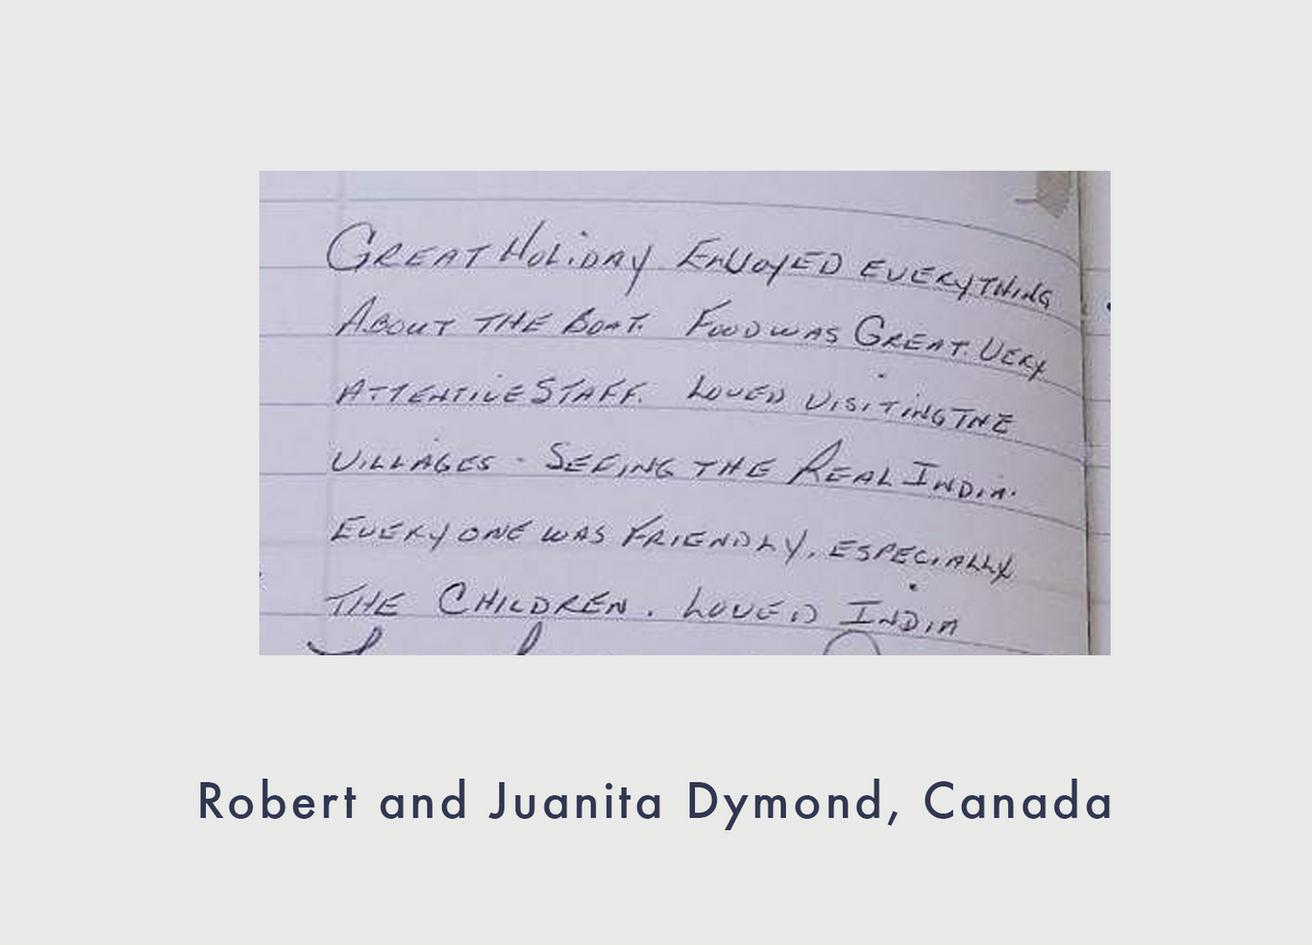 robert and juanita dymond canada sukapha